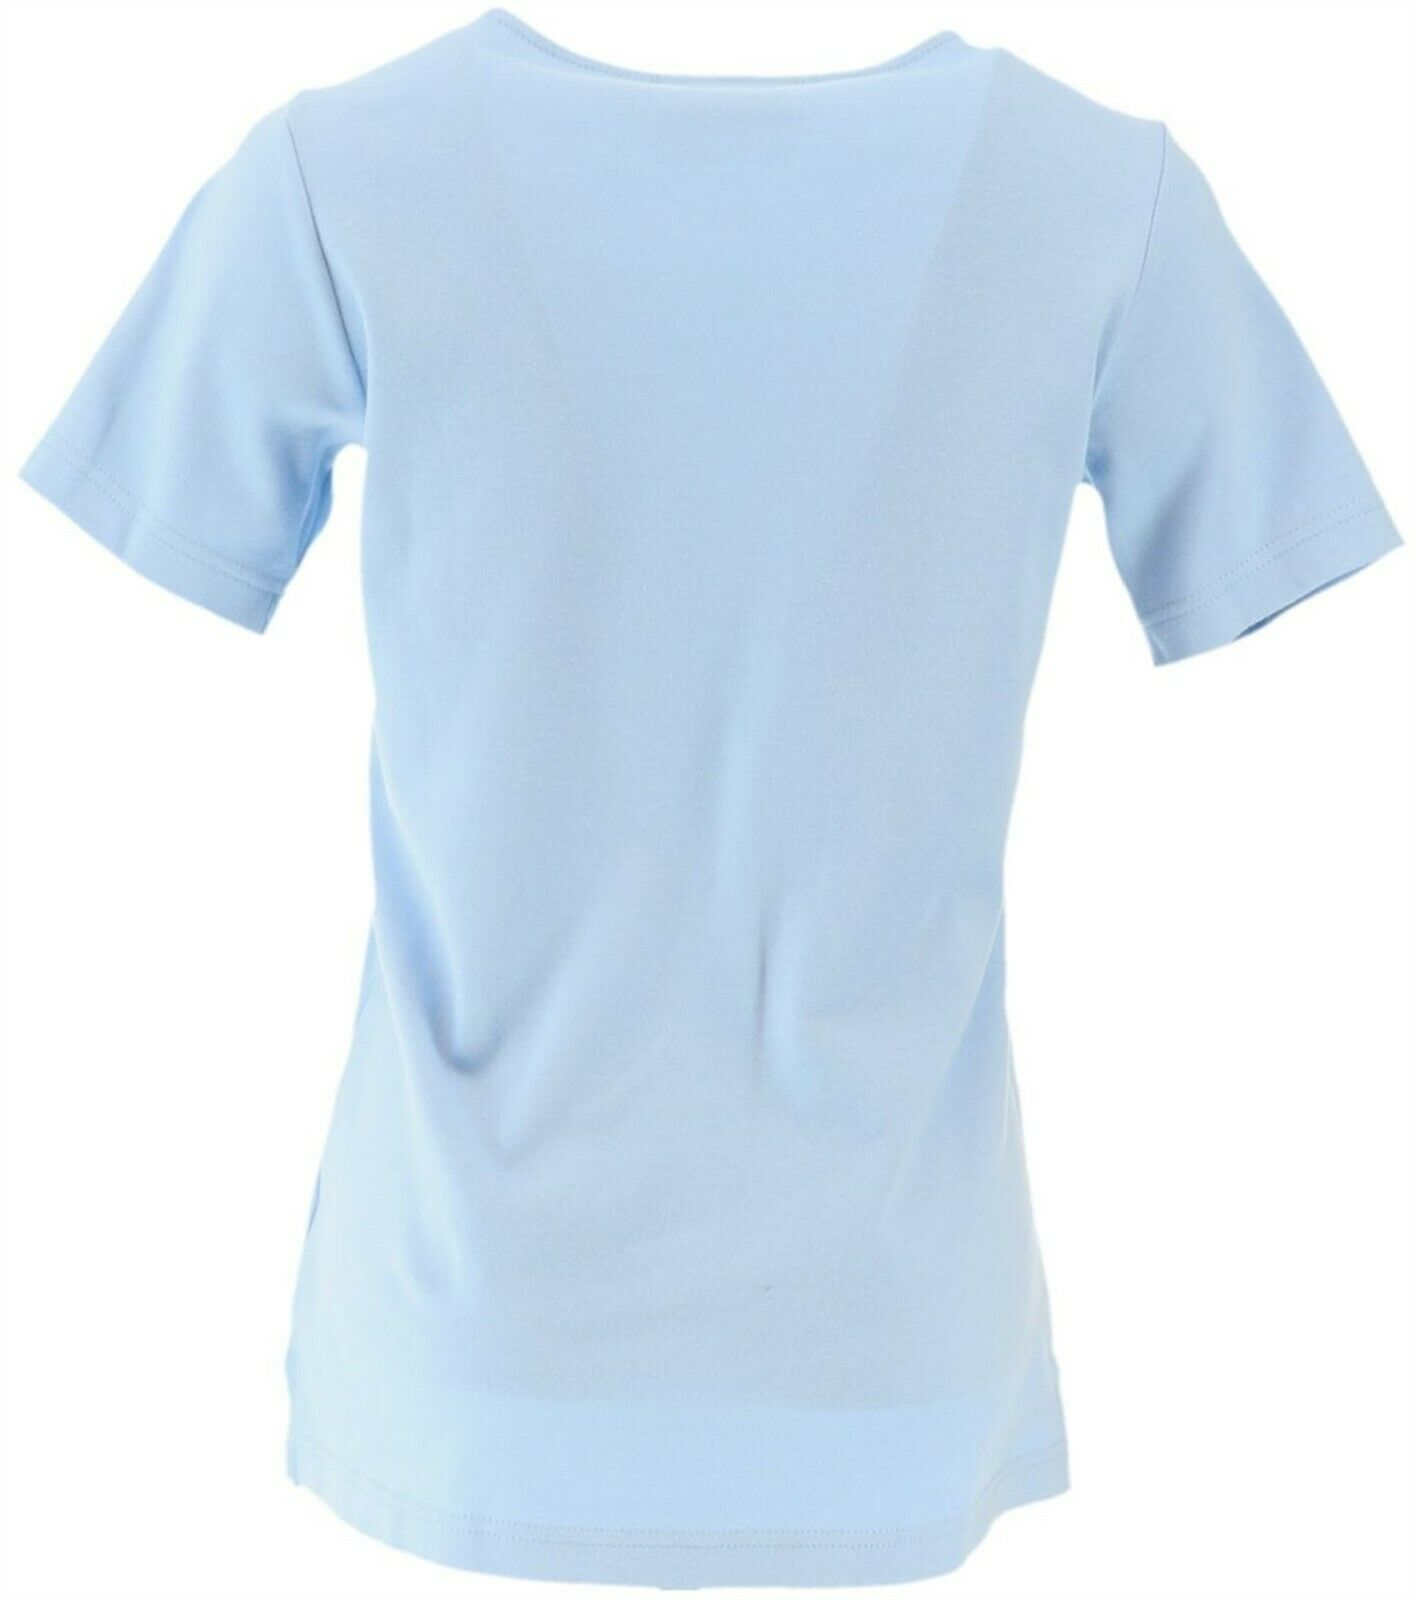 Quacker Factory Set Two Sparkle Shine T-shirts Pale Blue Lime S NEW A262867